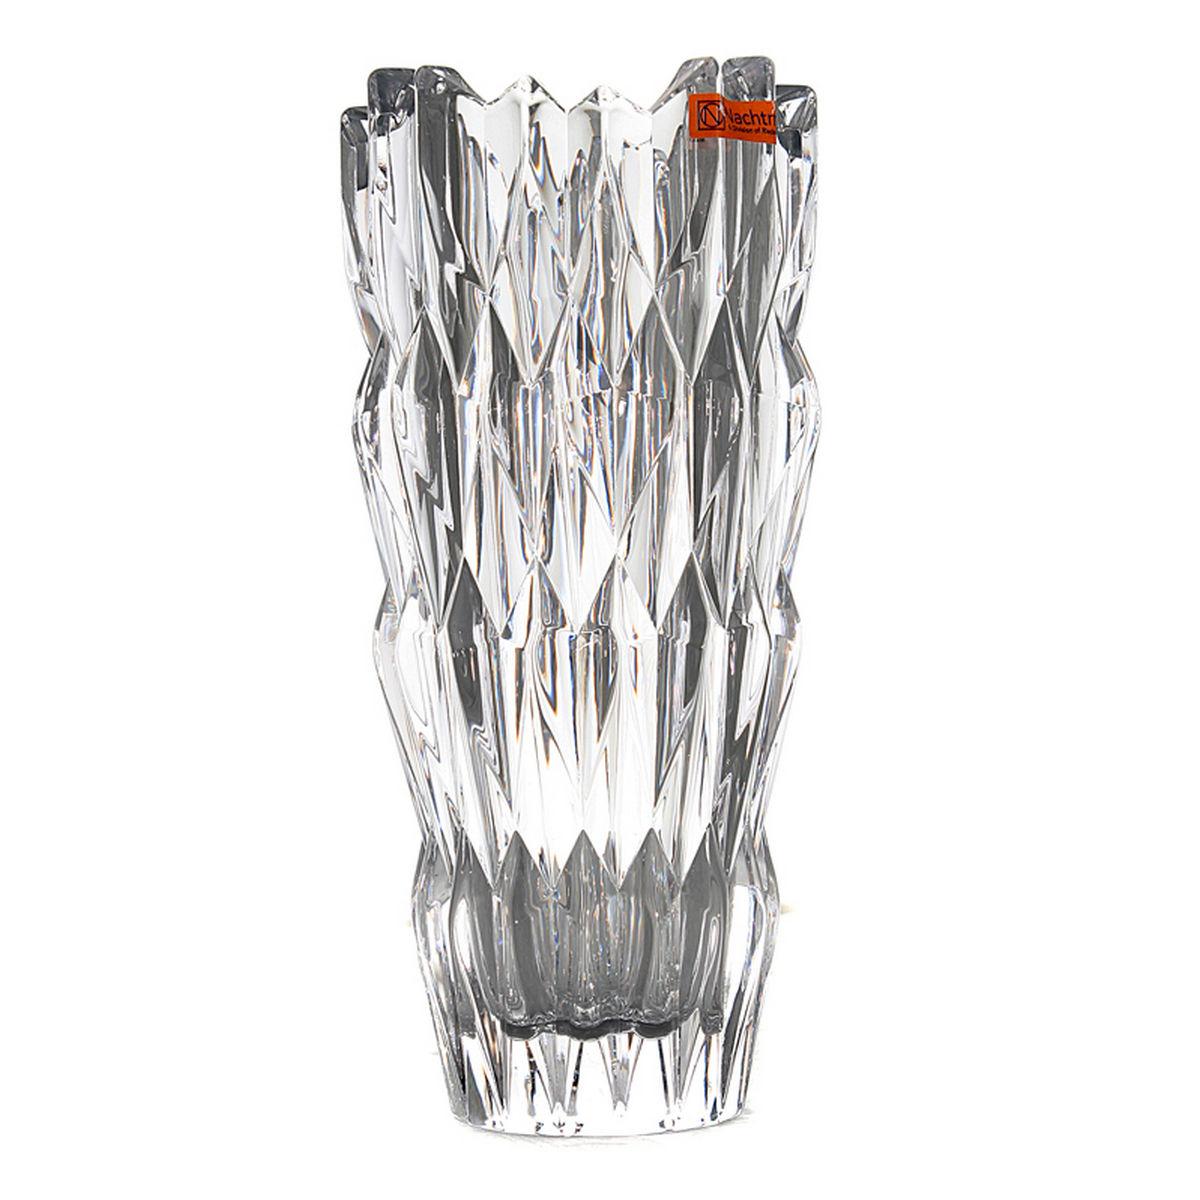 Quartz Vaza Cristalin 26 Cm 2021 aranjareamesei.ro